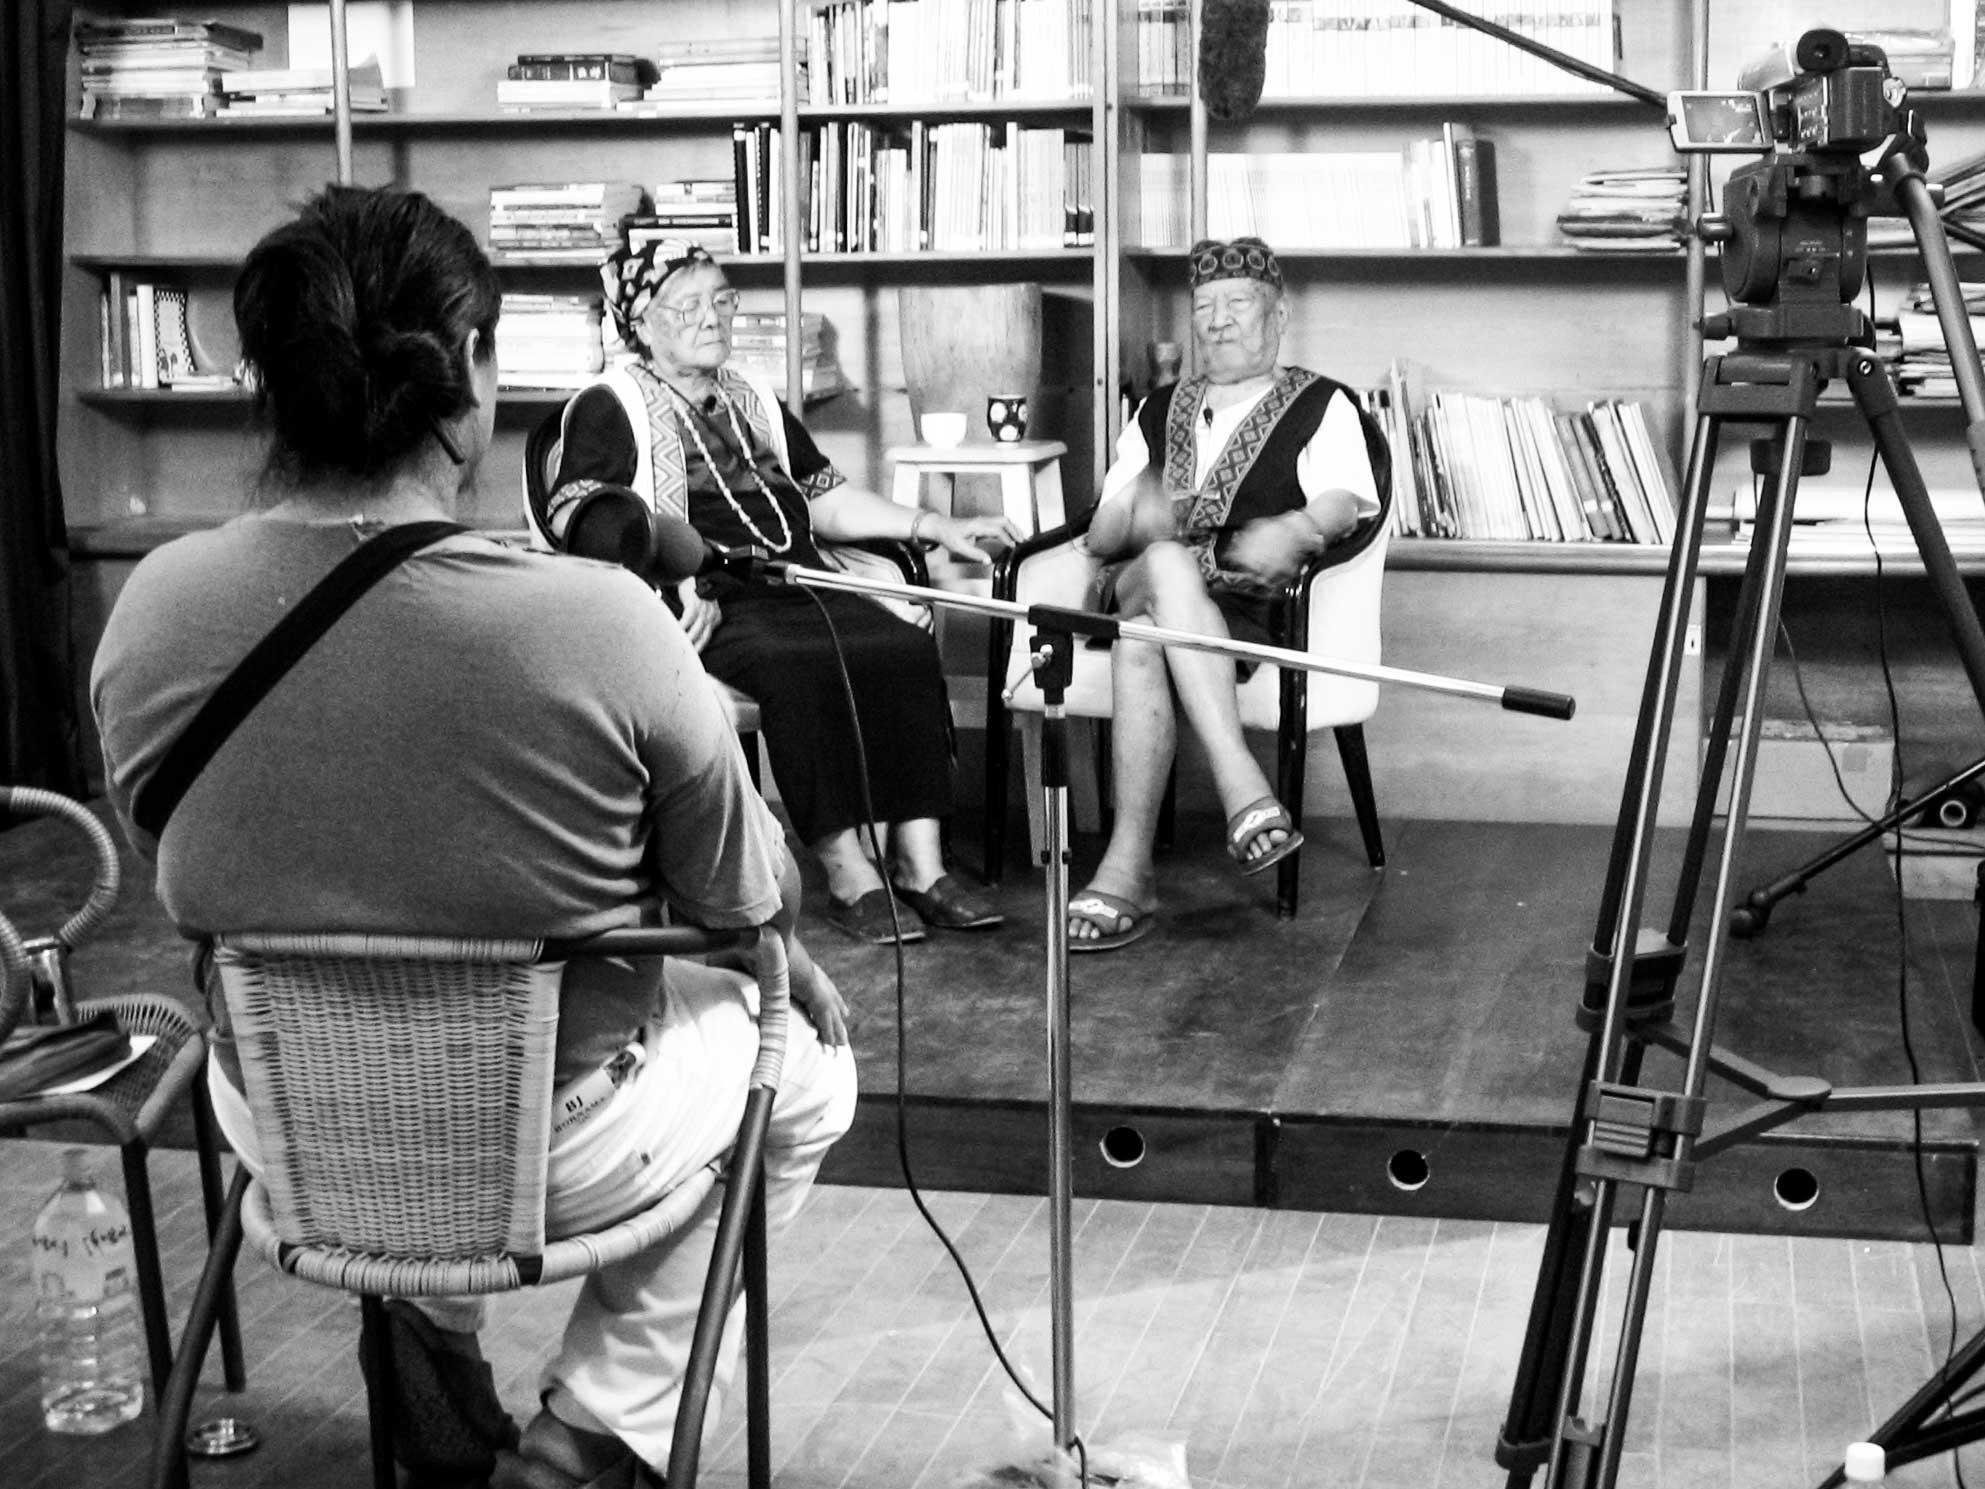 Interview setup | Nabu, Langus and Biung Istanda | Laipunuk Taiwan Bunun Hunter Research | Dr Steven A Martin | SAGE Ethnography